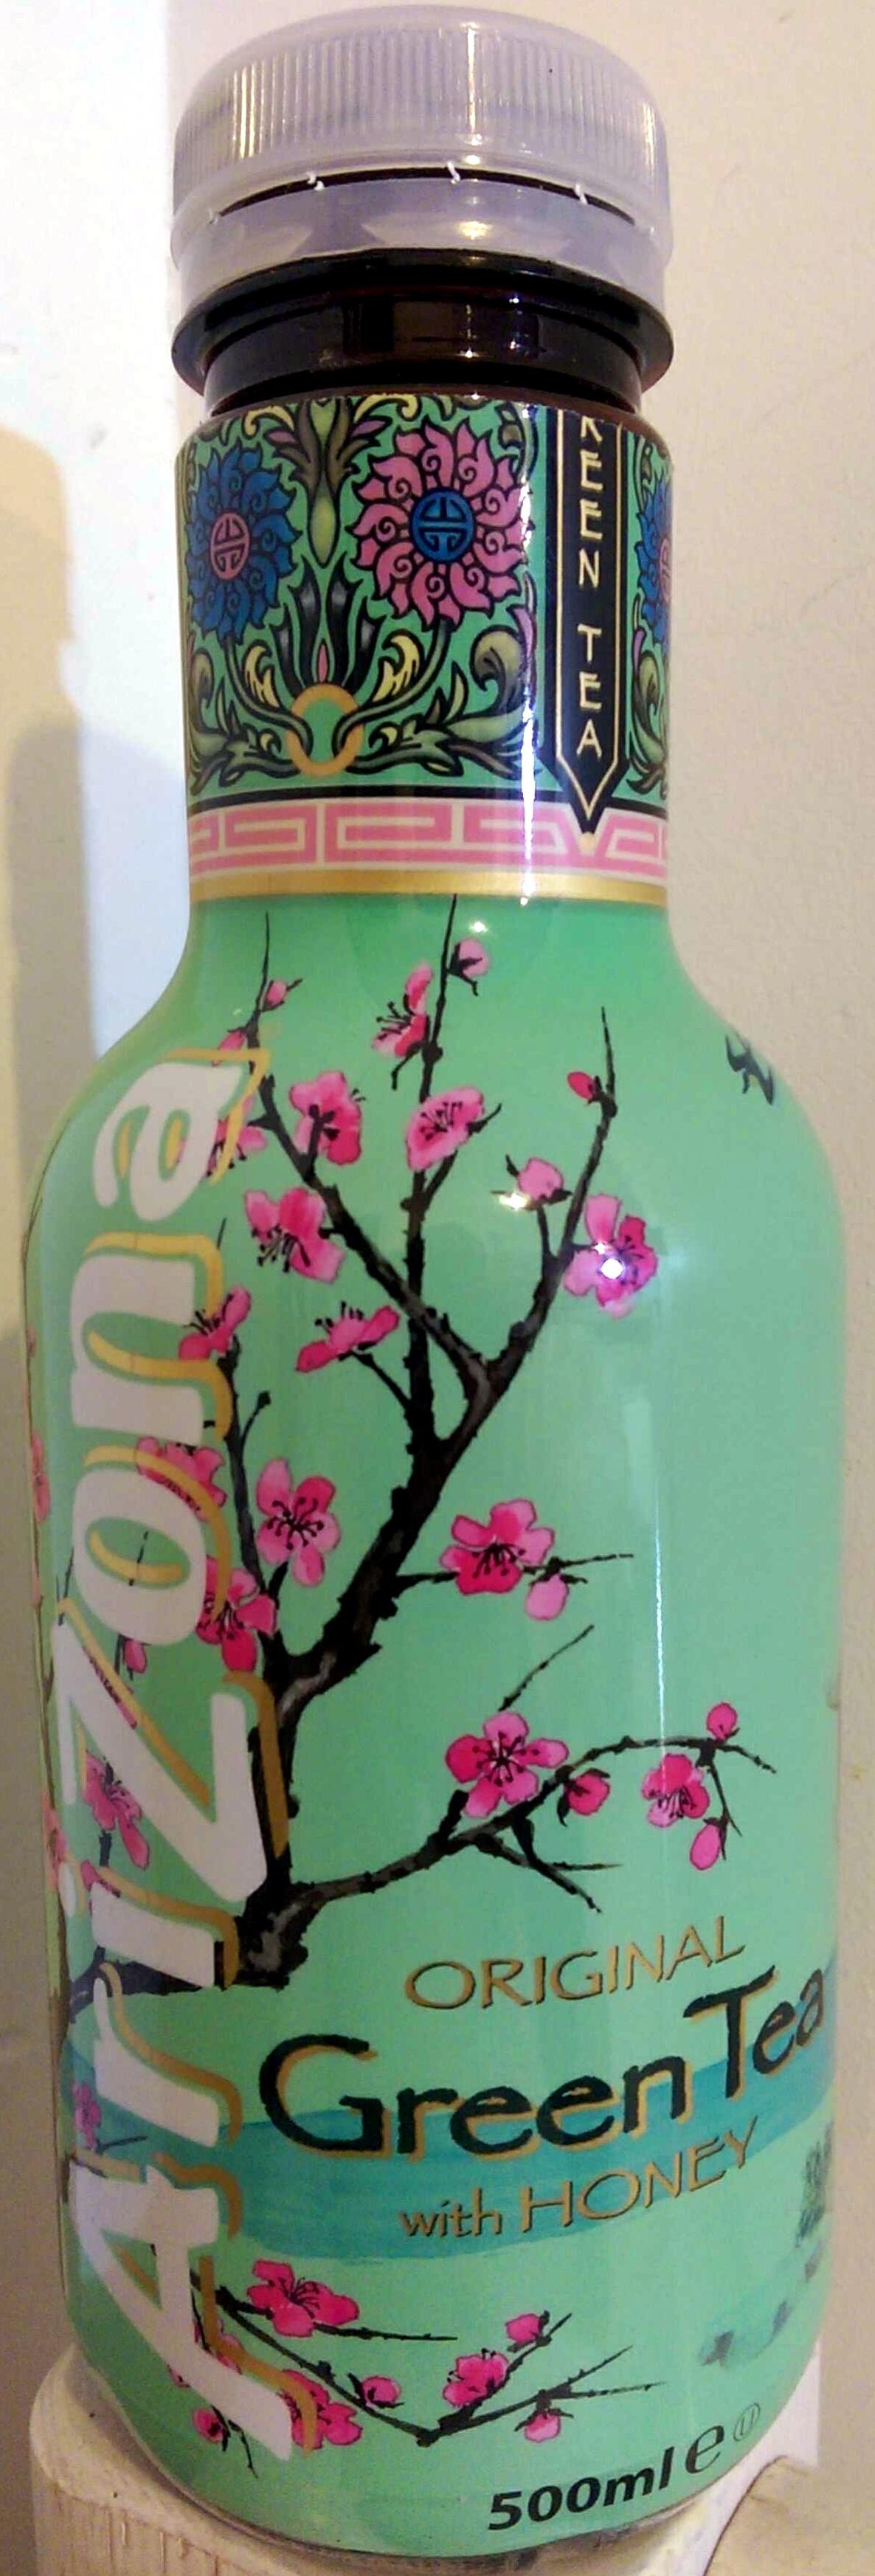 Original green tea with honey - Product